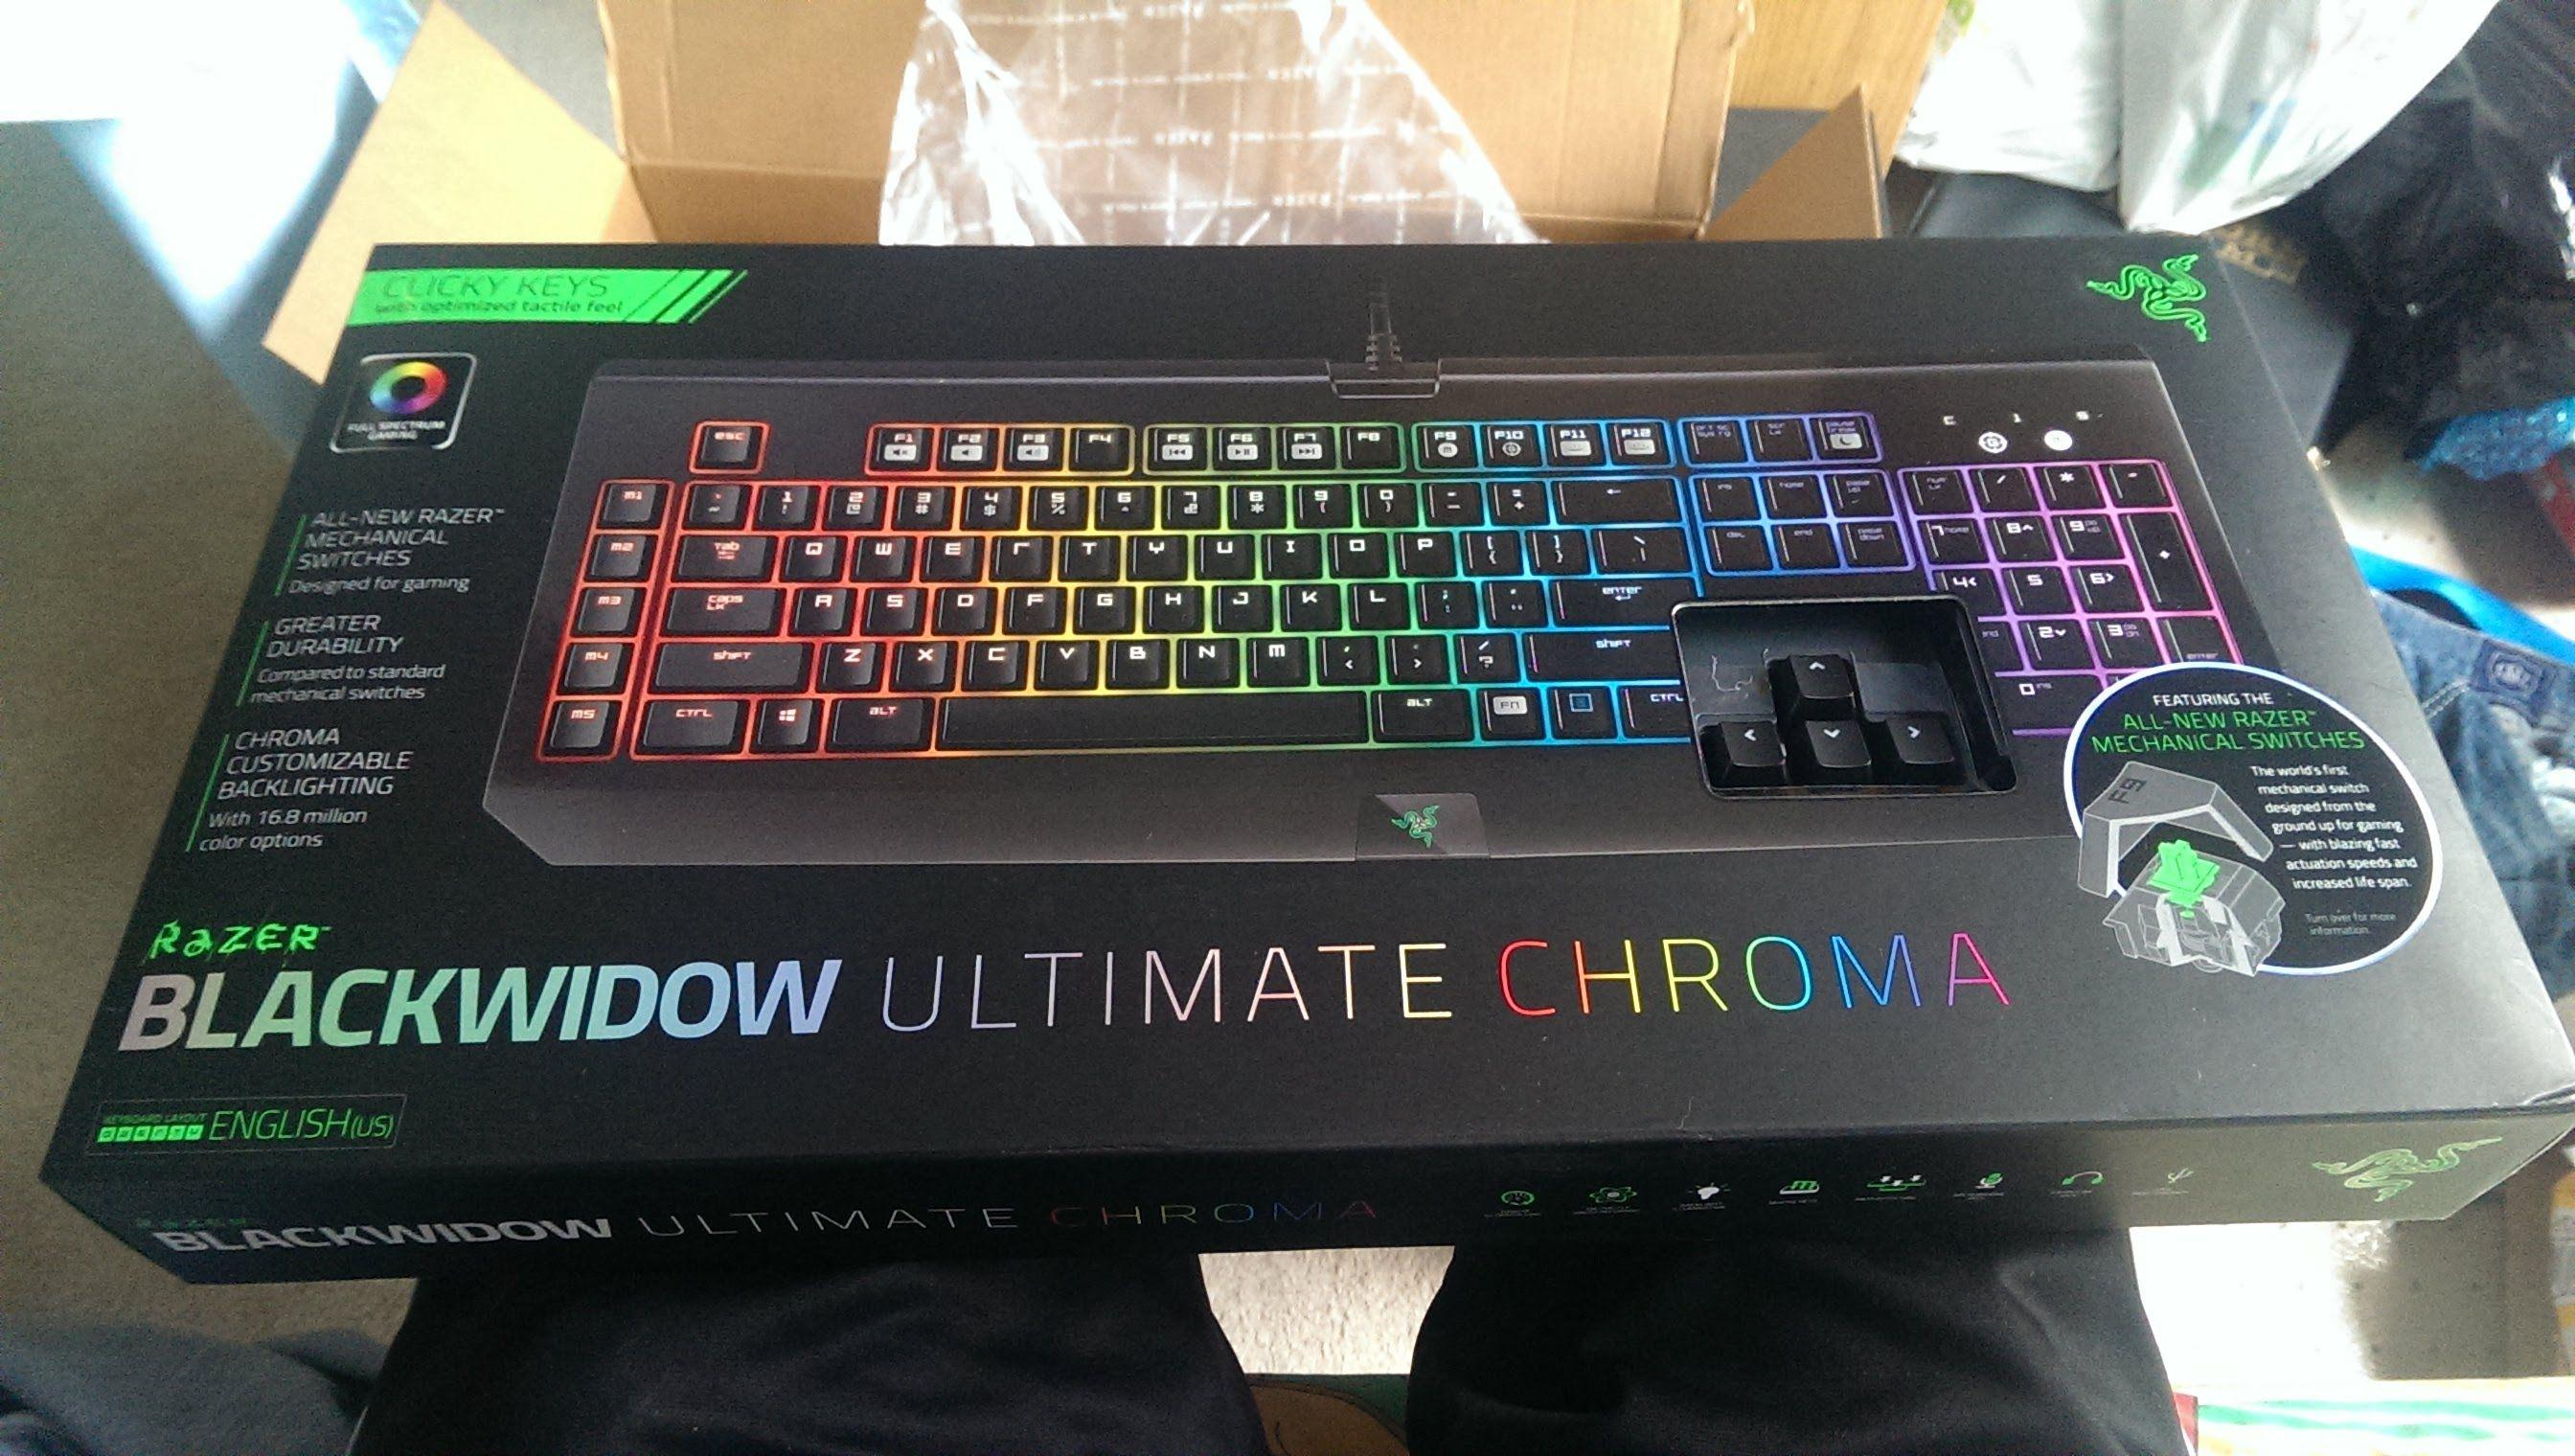 Razer Blackwidow Ultimate Chroma Keyboard Unboxing